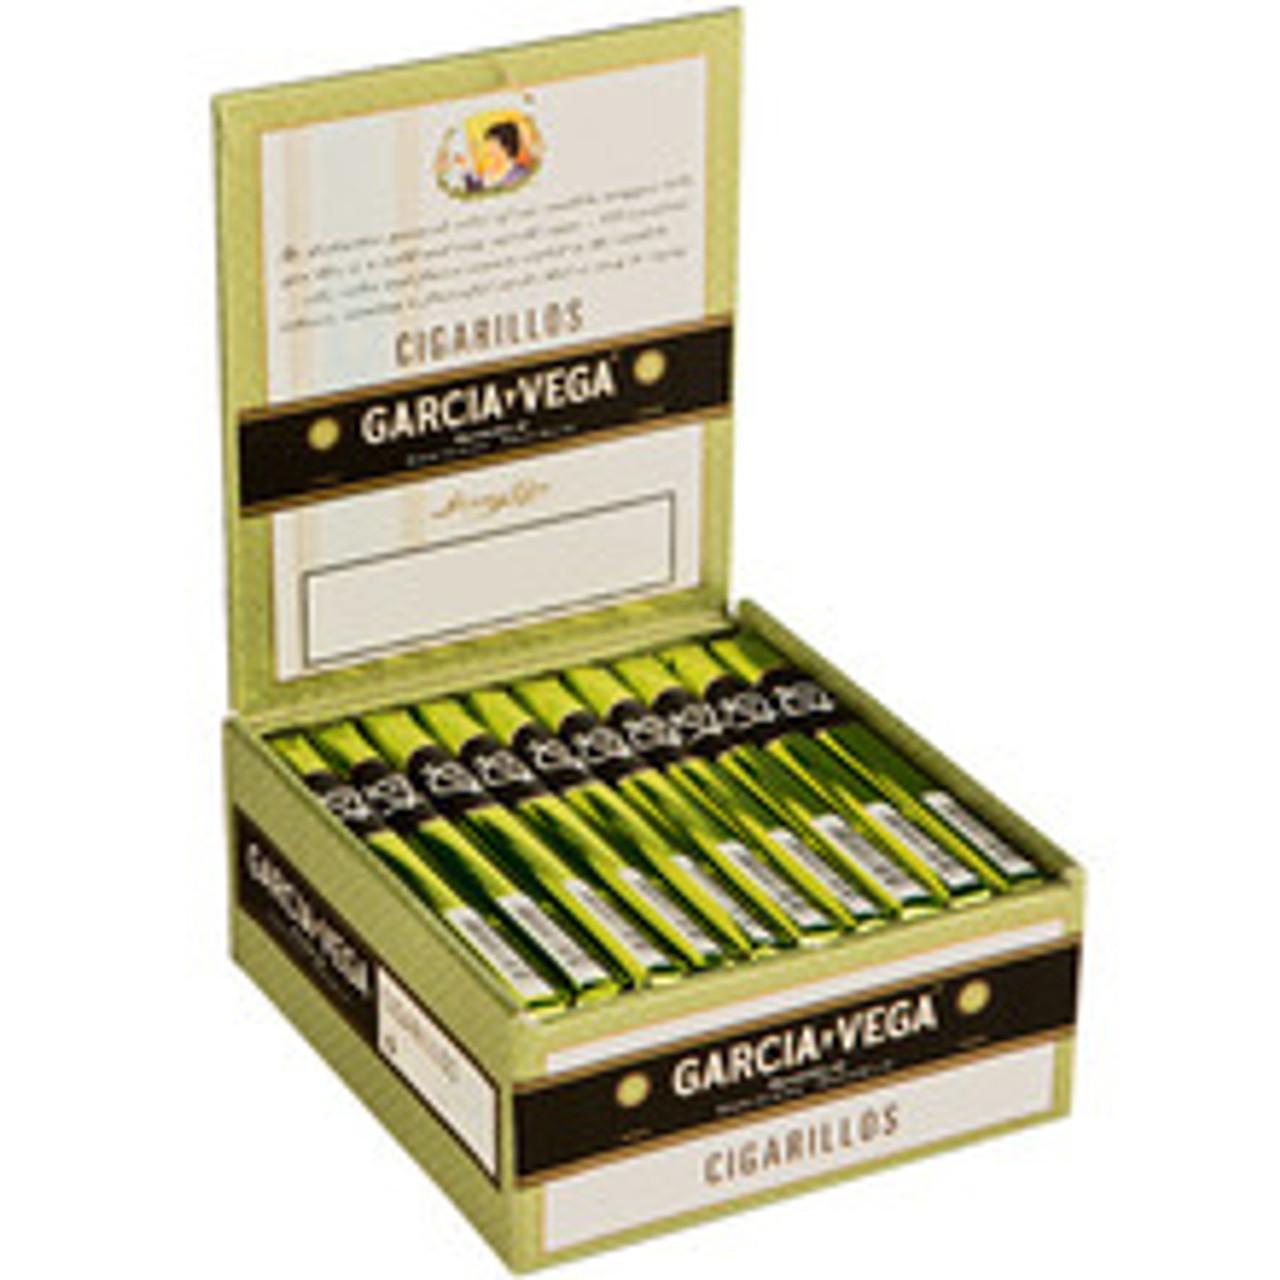 Garcia Y Vega Cigarillo Cigars (Box of 50) - Candela